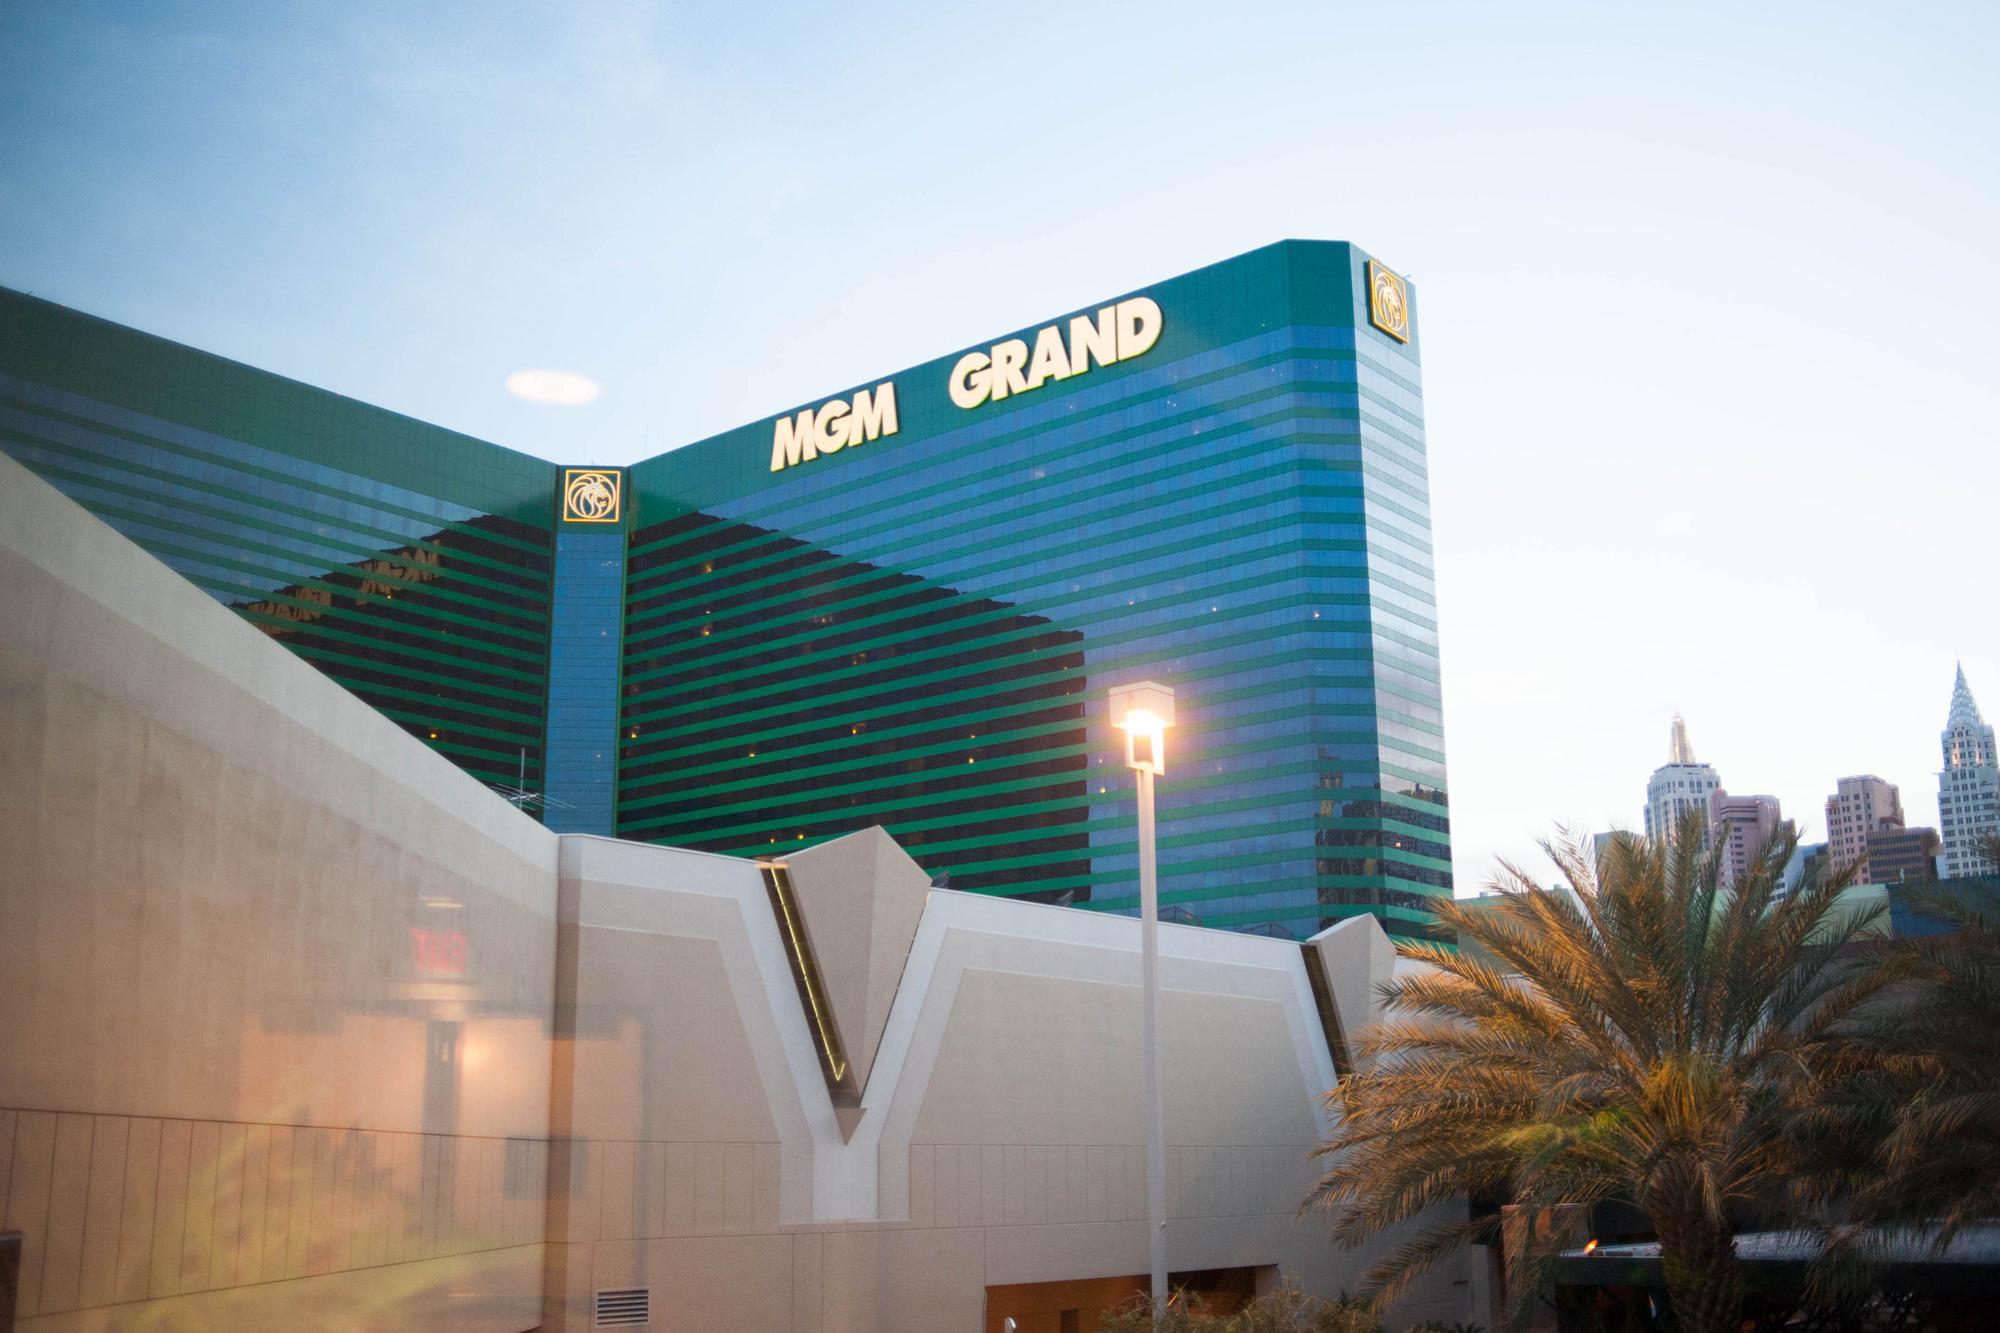 MGM Grand Hotel exterior